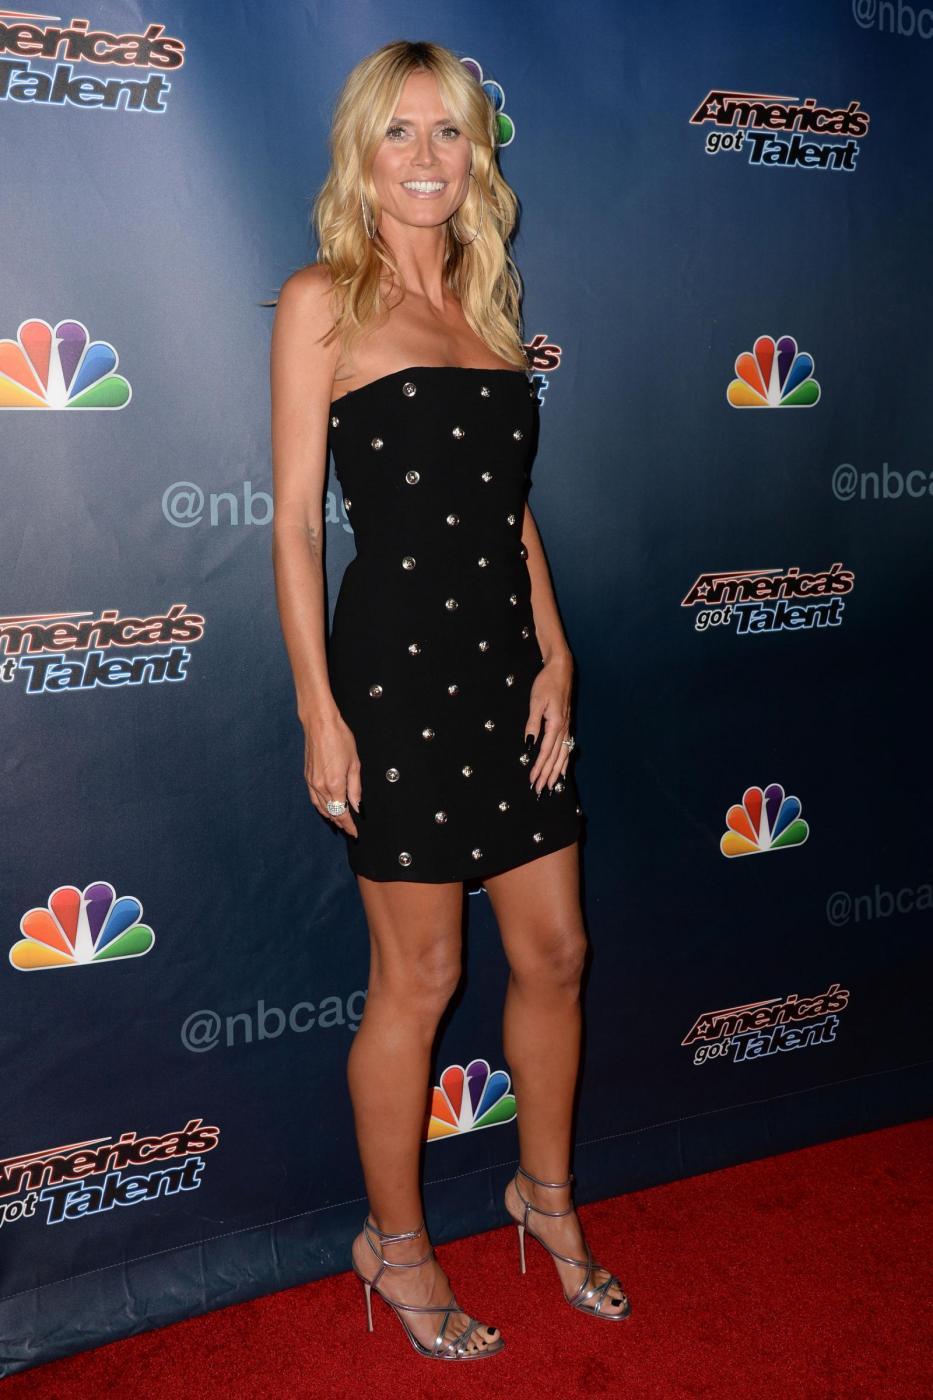 Heidi Klum, mini abito e tacchi per America's Got Talent